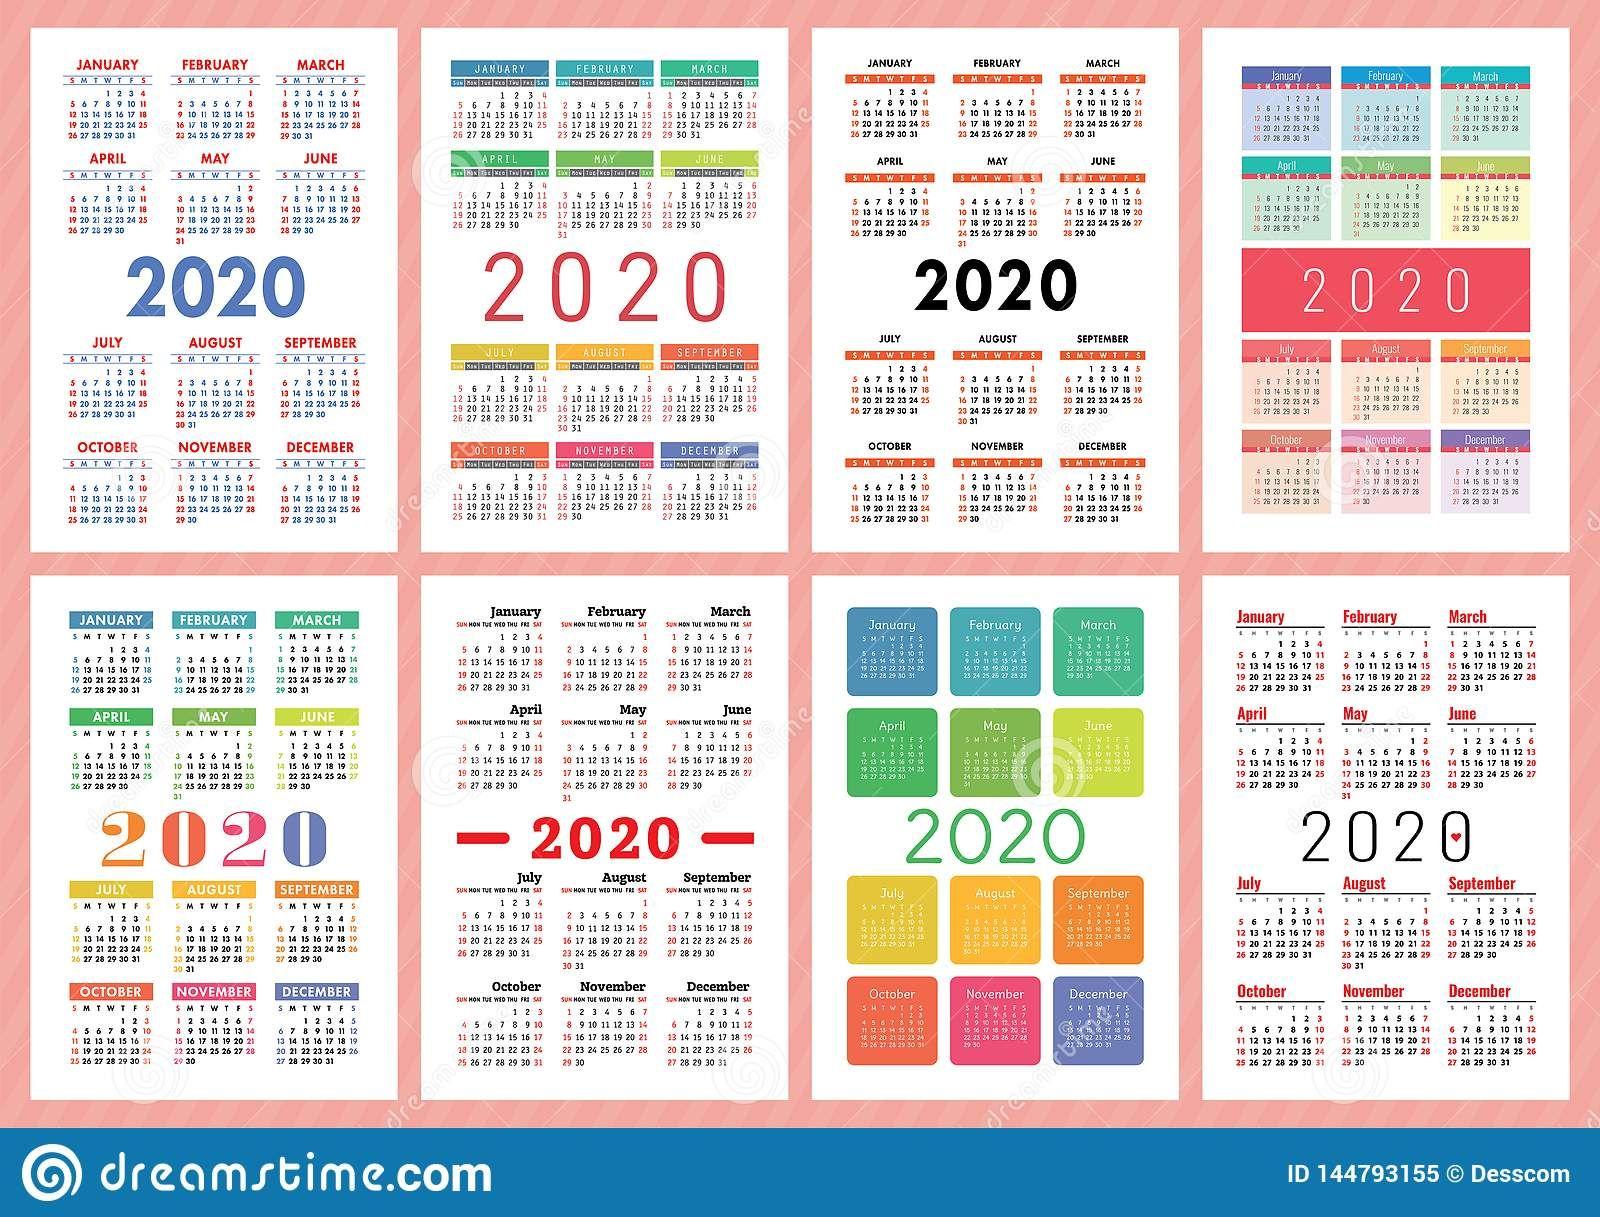 20+ 3 Year Calendar 2020 To 2023 - Free Download Printable ...